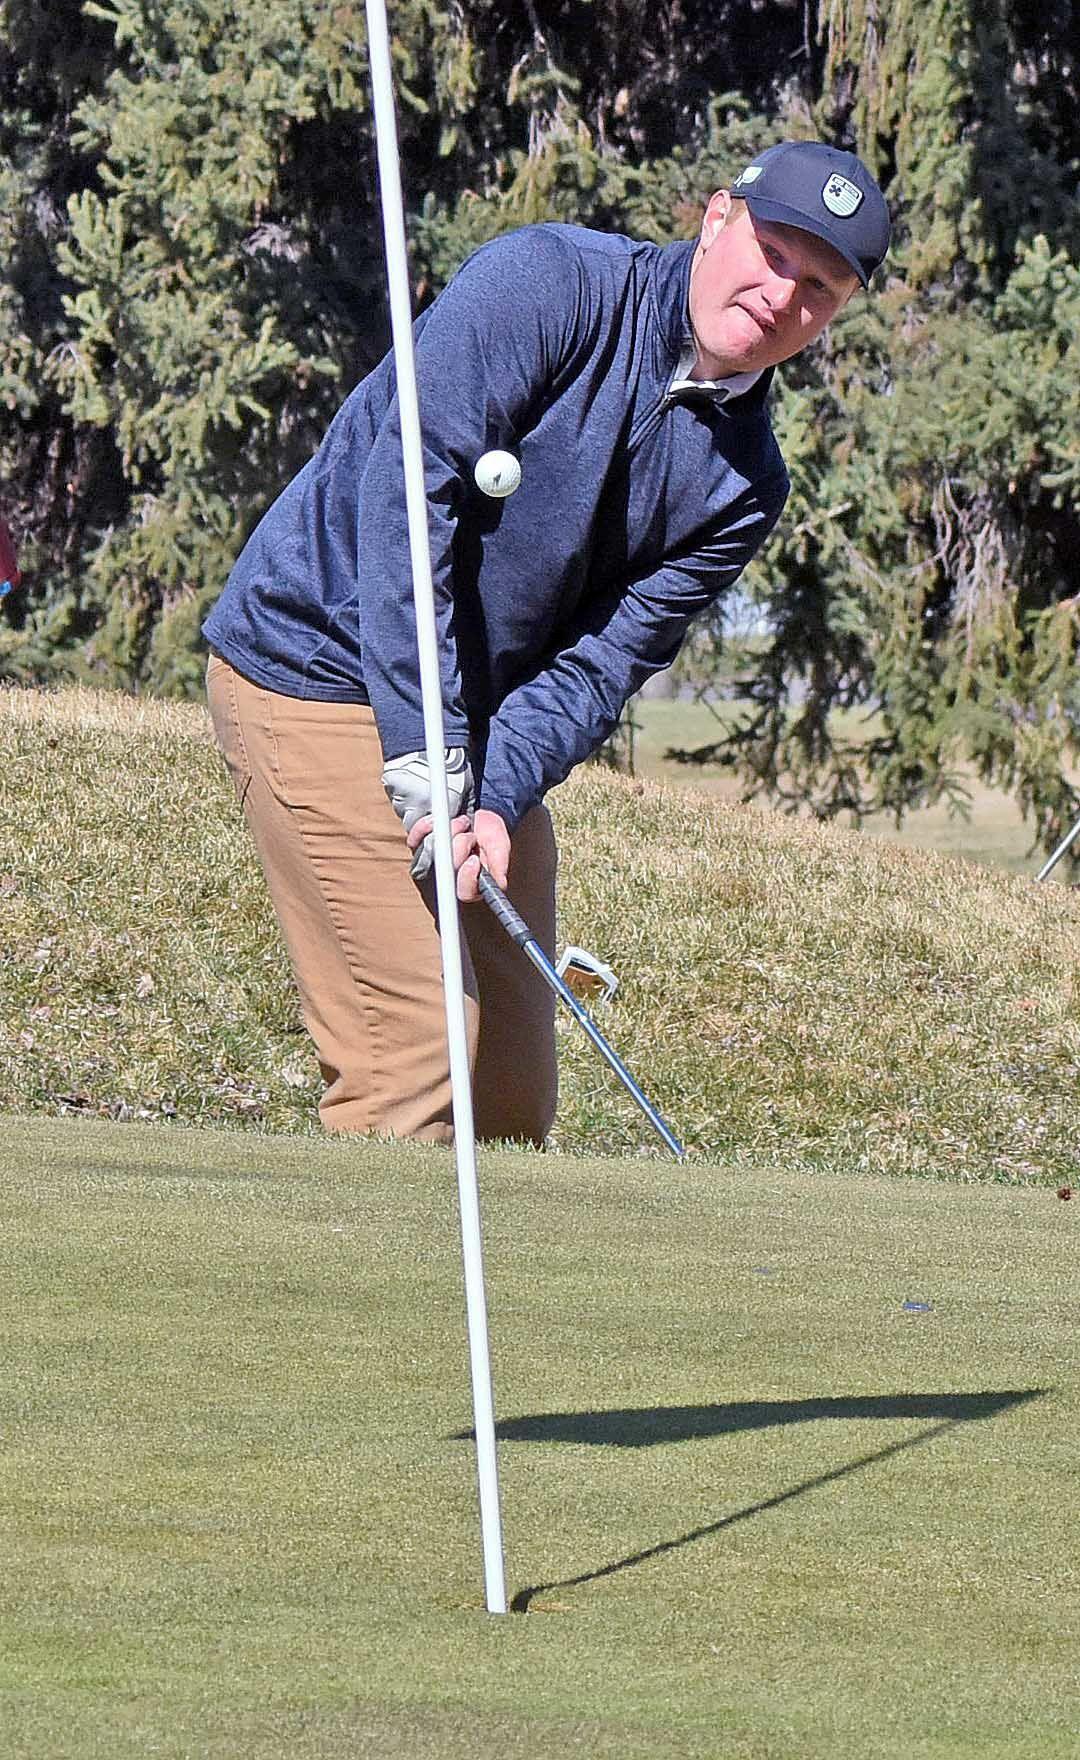 041821-spt-golf5.jpg